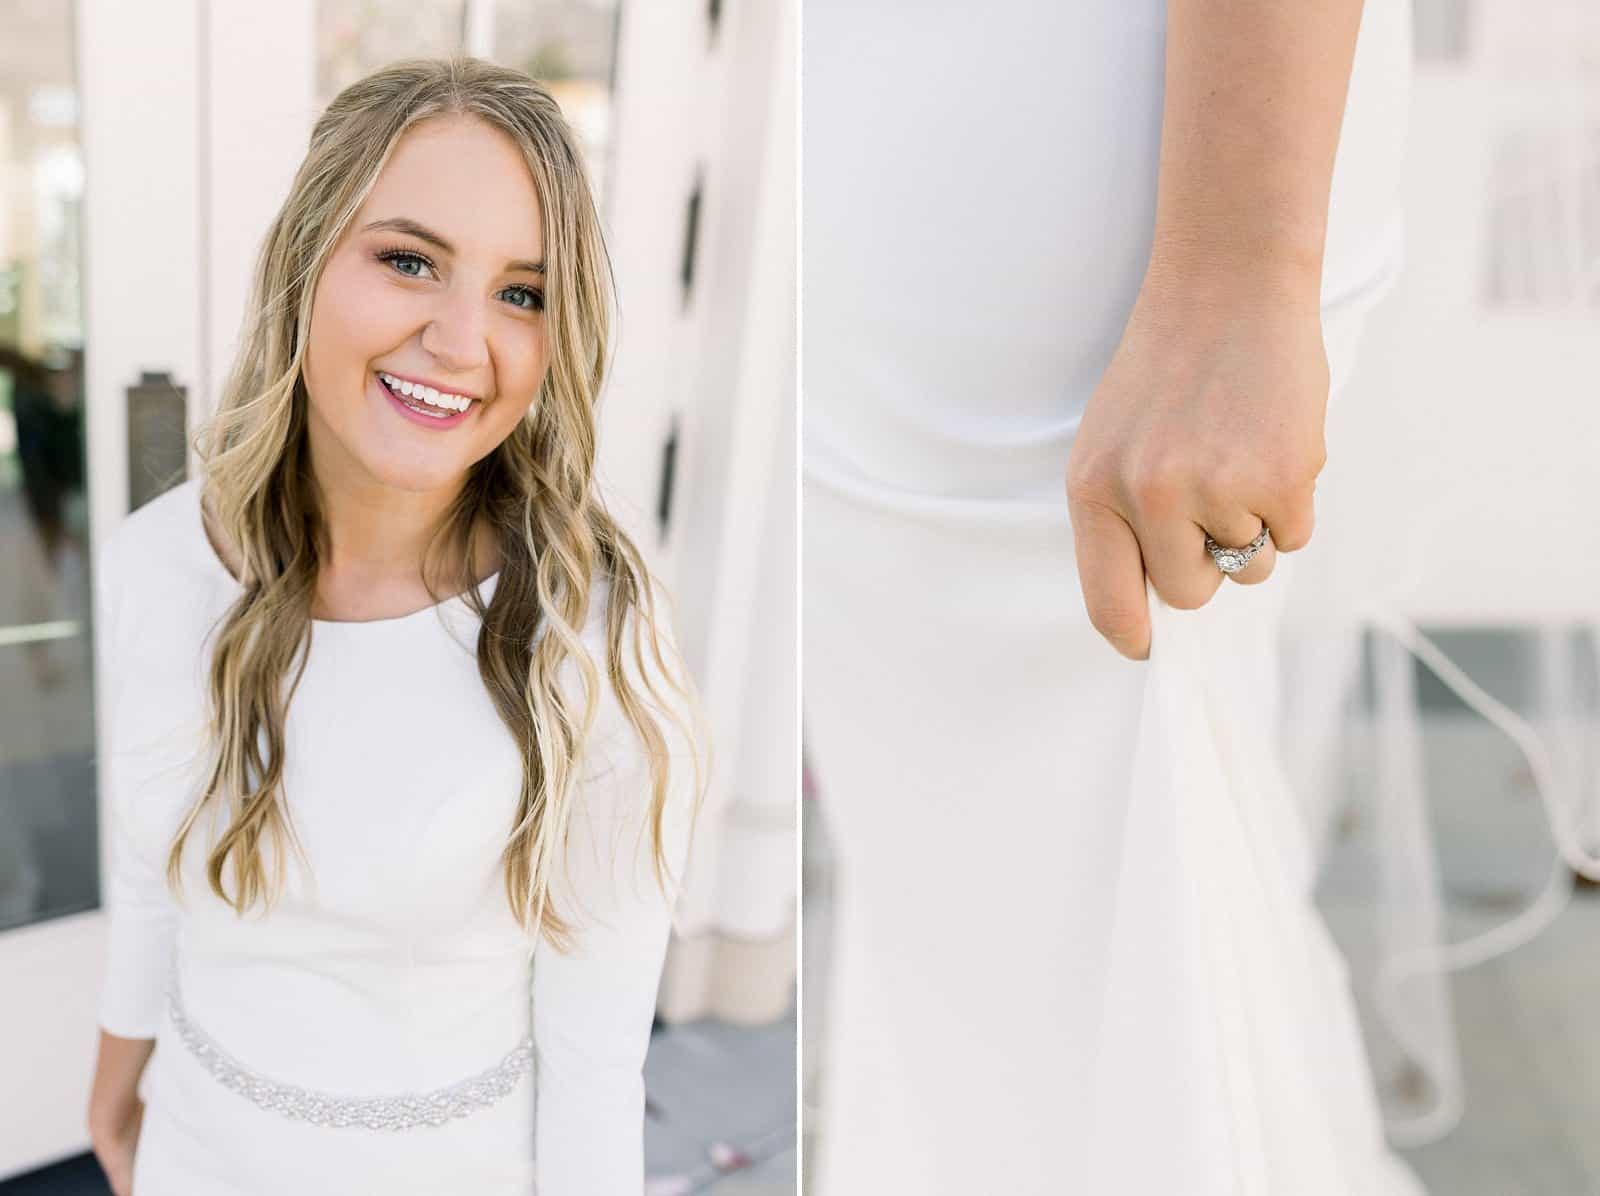 modest wedding dress, spring bride, wedding ring, engagement ring, long wedding hairstyle, LDS bride, modern wedding dress